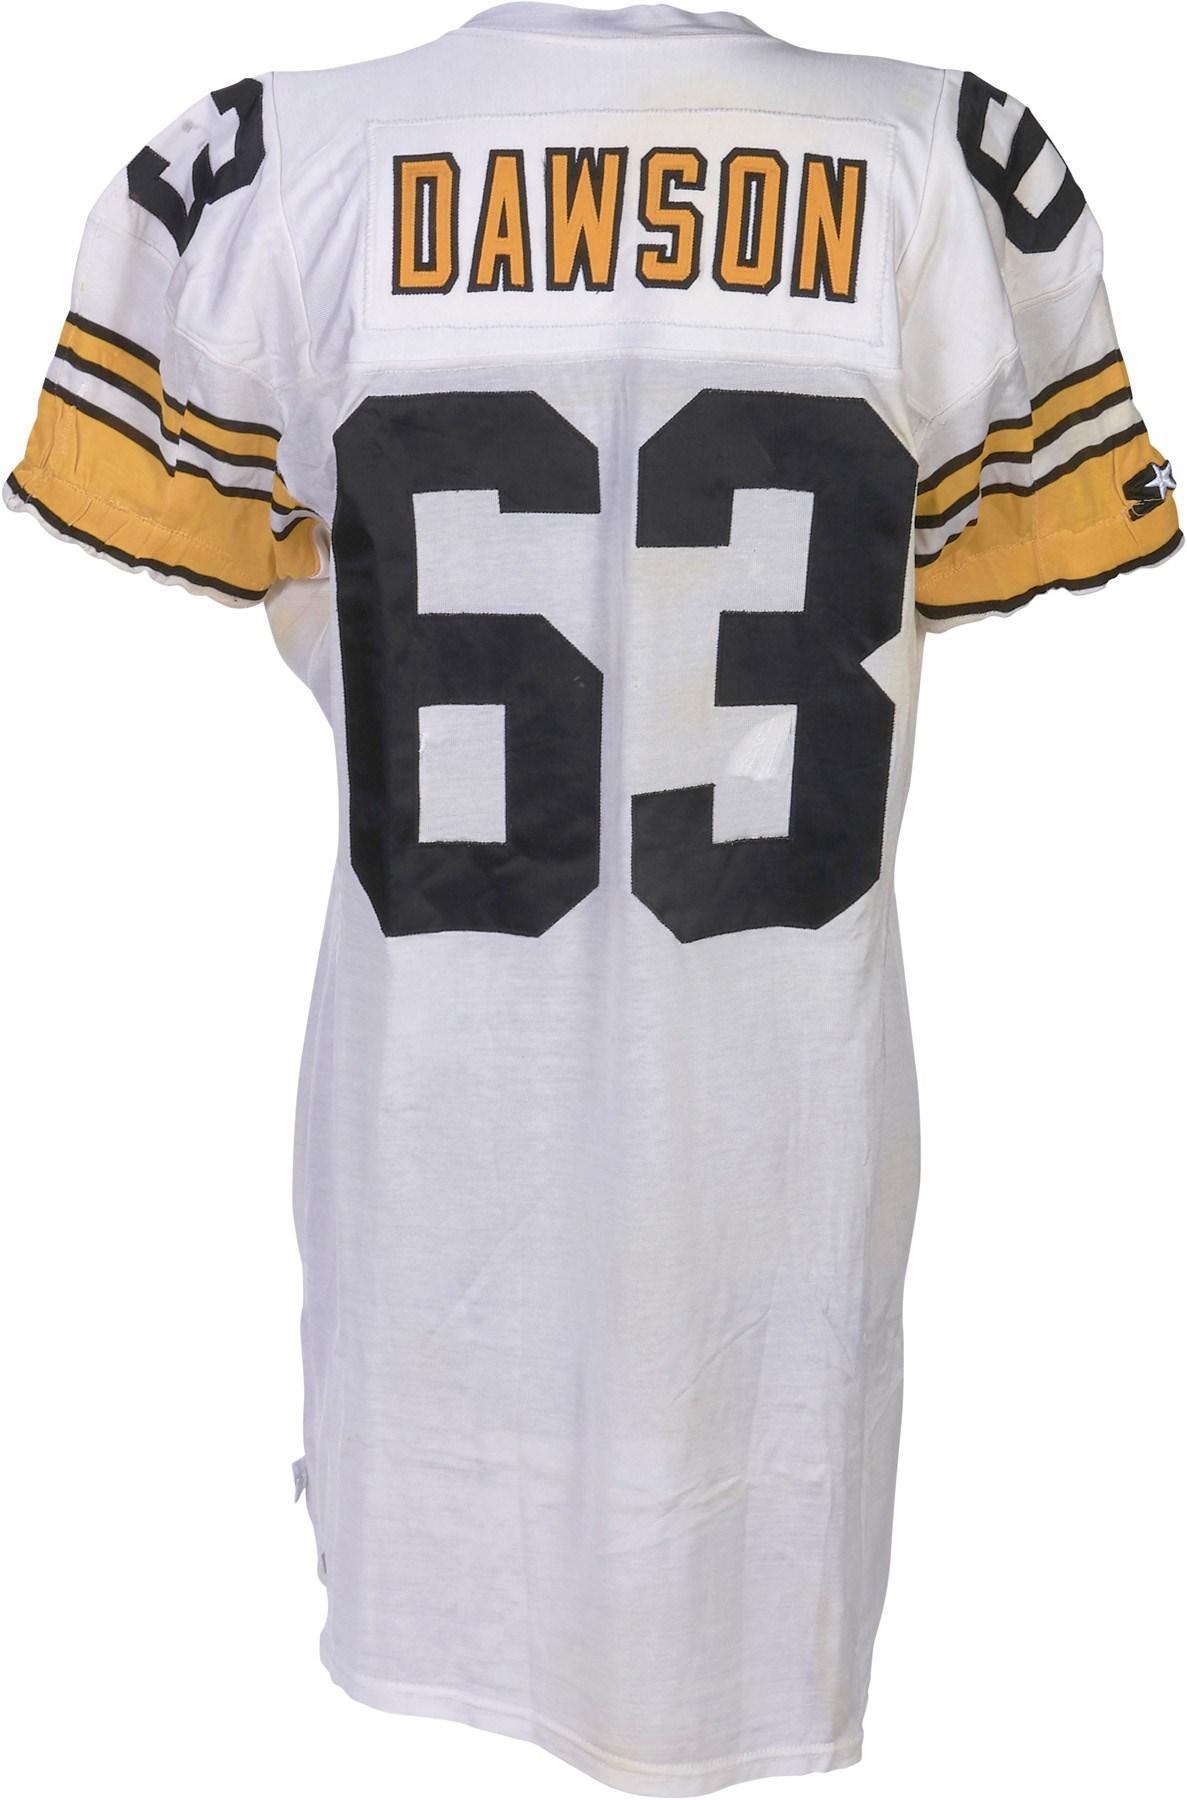 354772d284f 1993 Dermontti Dawson Pittsburgh Steelers Game Worn Jersey (Photo-Matched)